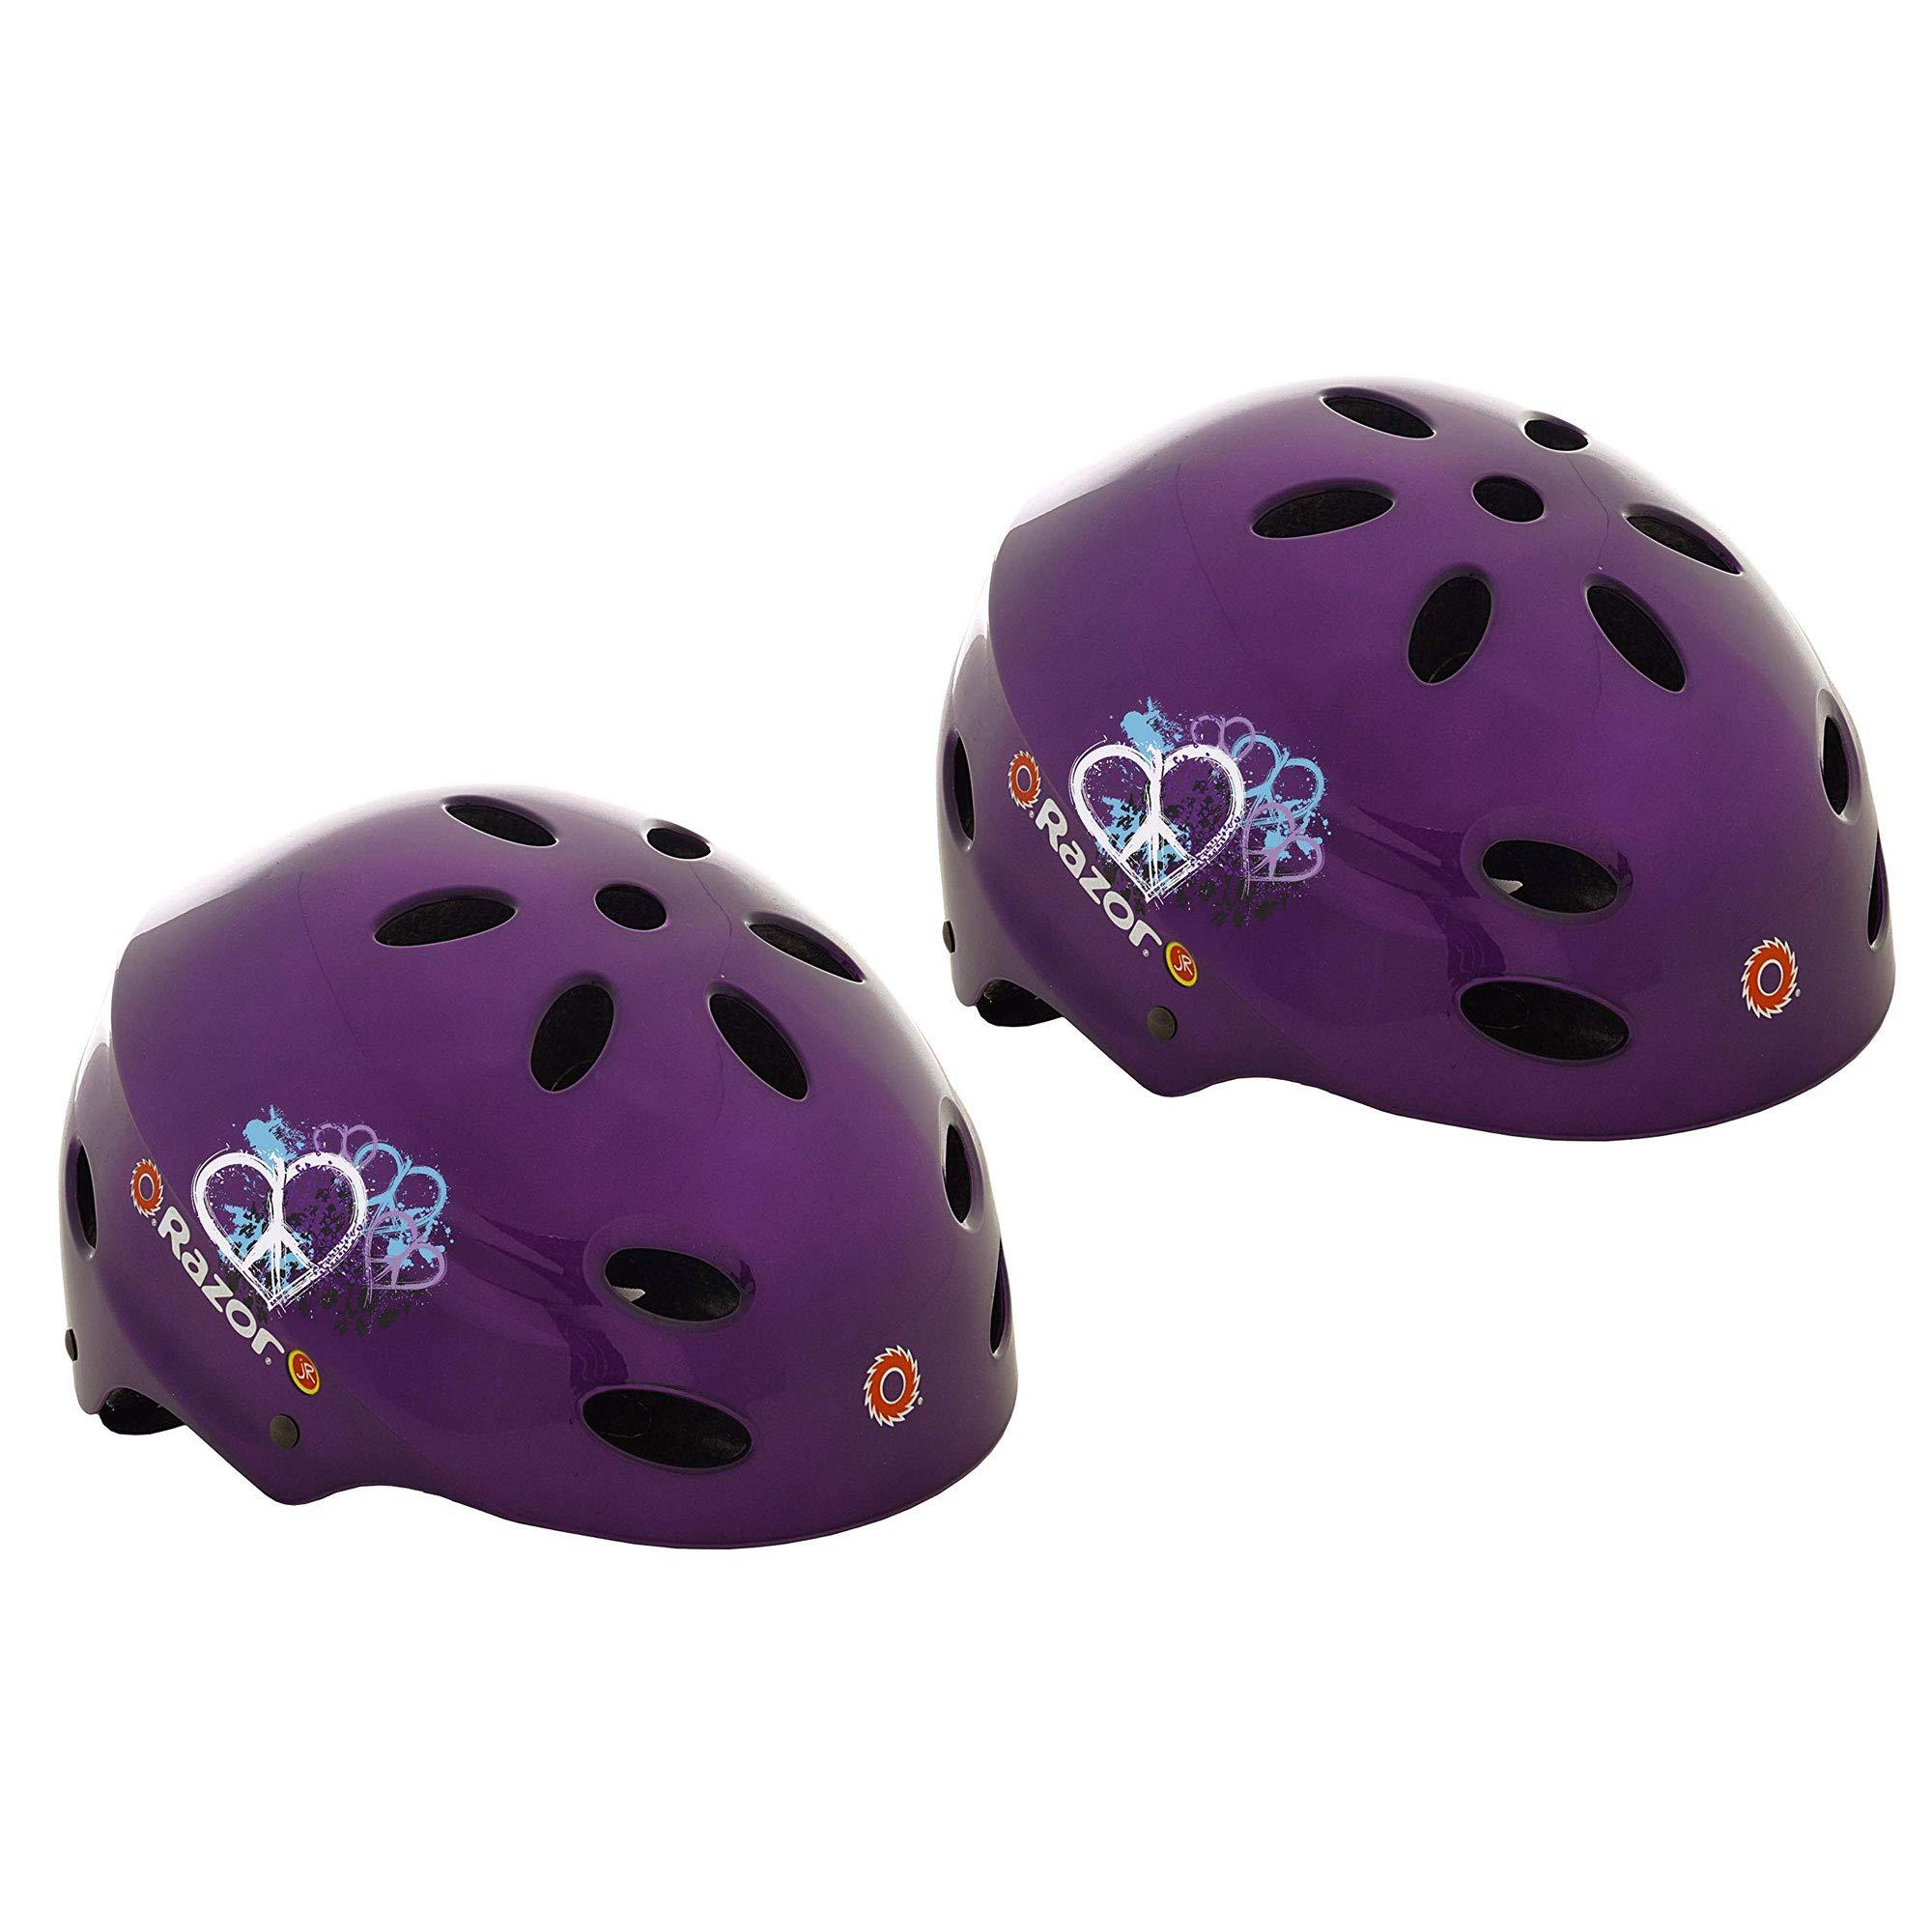 Razor V-17 Child Safety Sports Helmet for Children 5-8, Gloss Purple | 97945 (2 Pack)